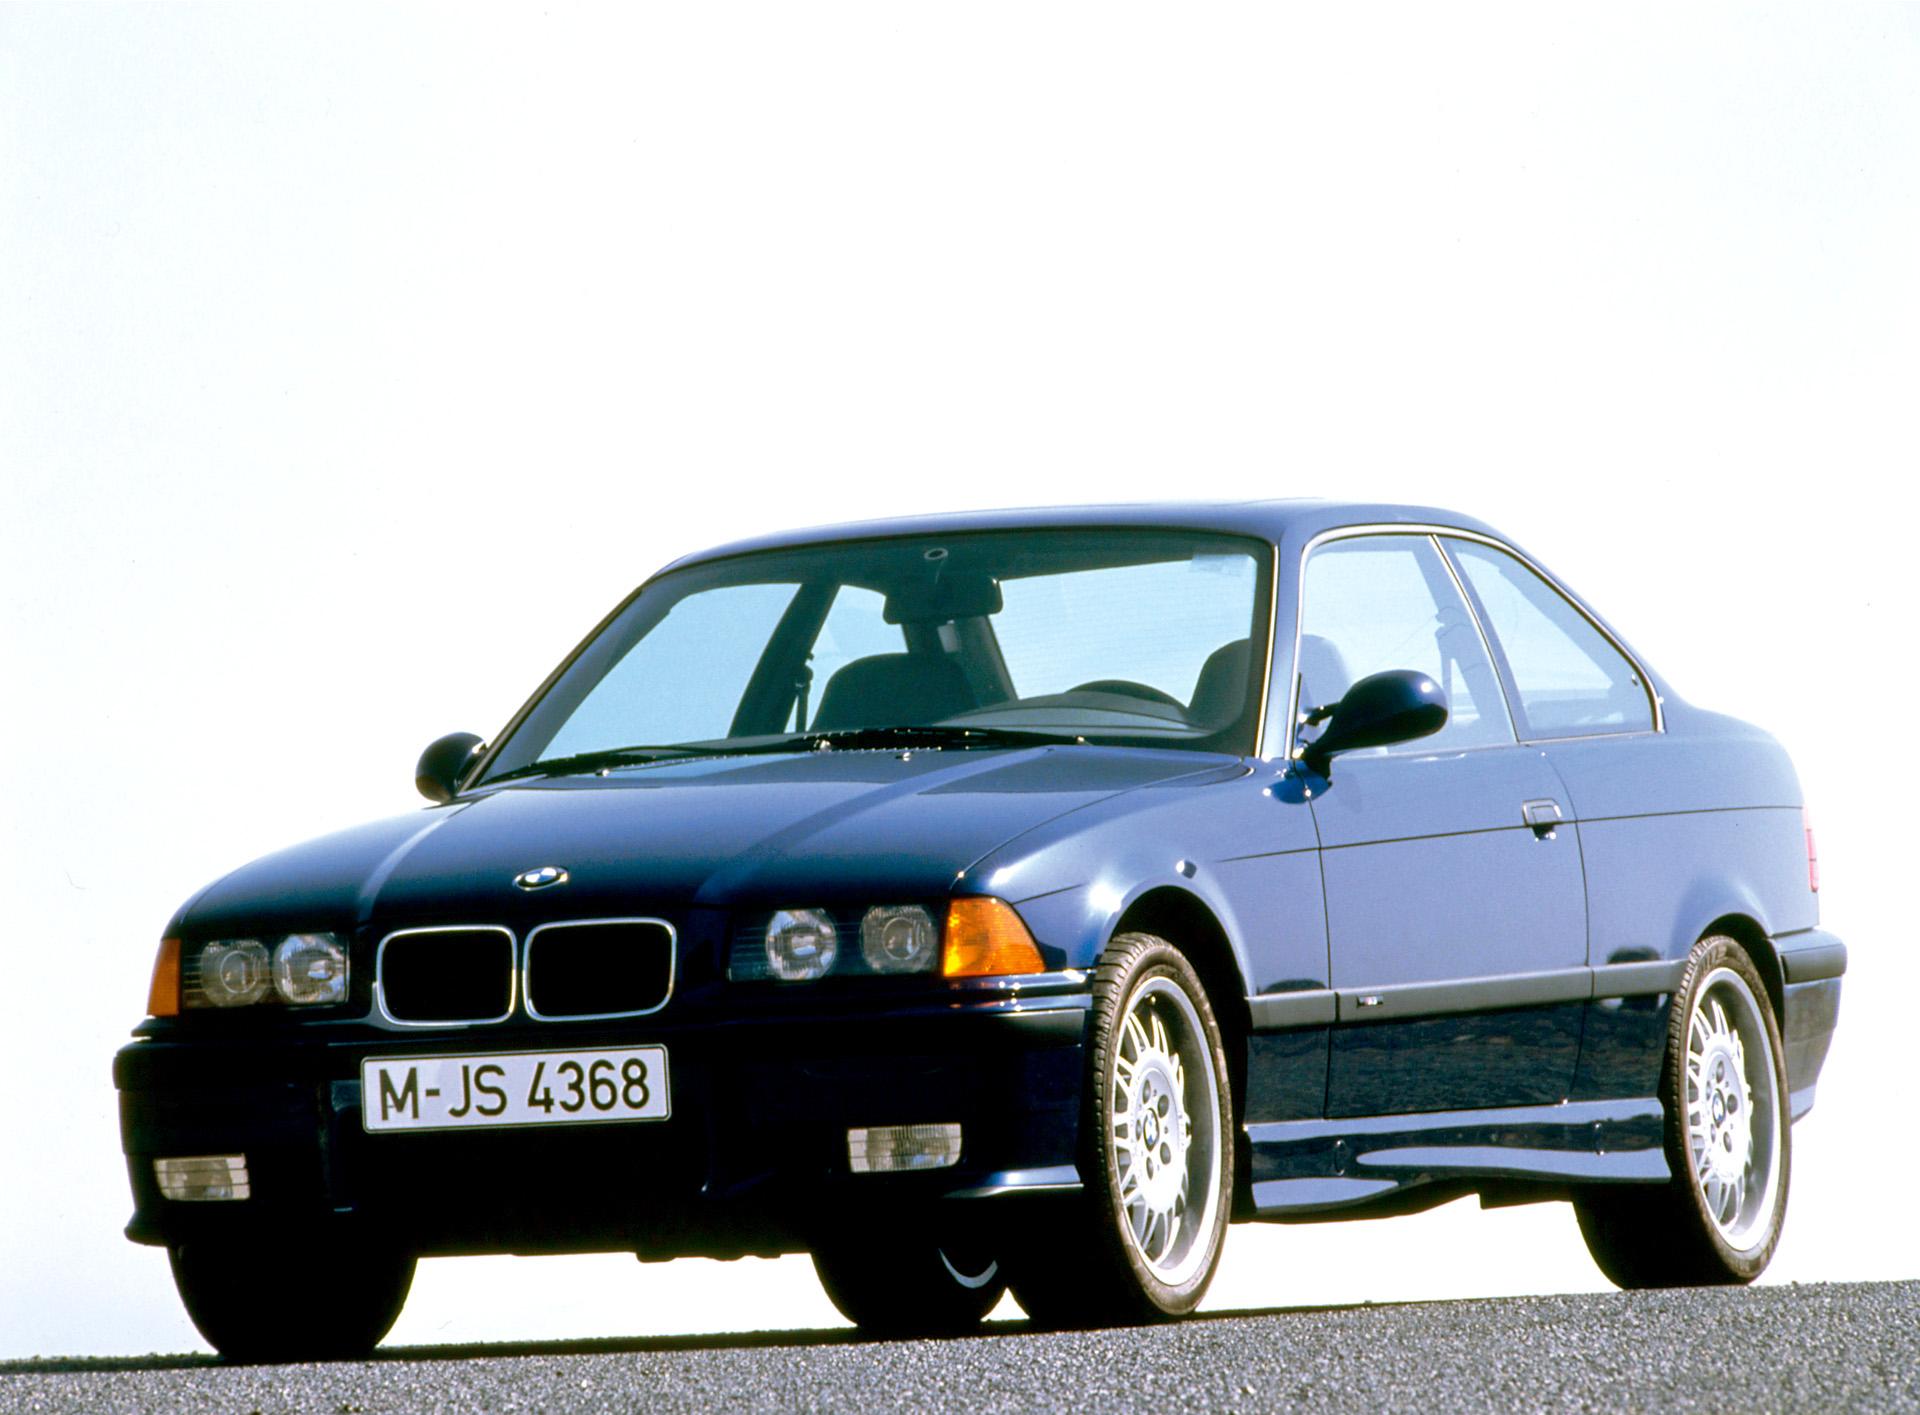 25th Anniversary Of The Bmw M3 Clublexus Lexus Forum